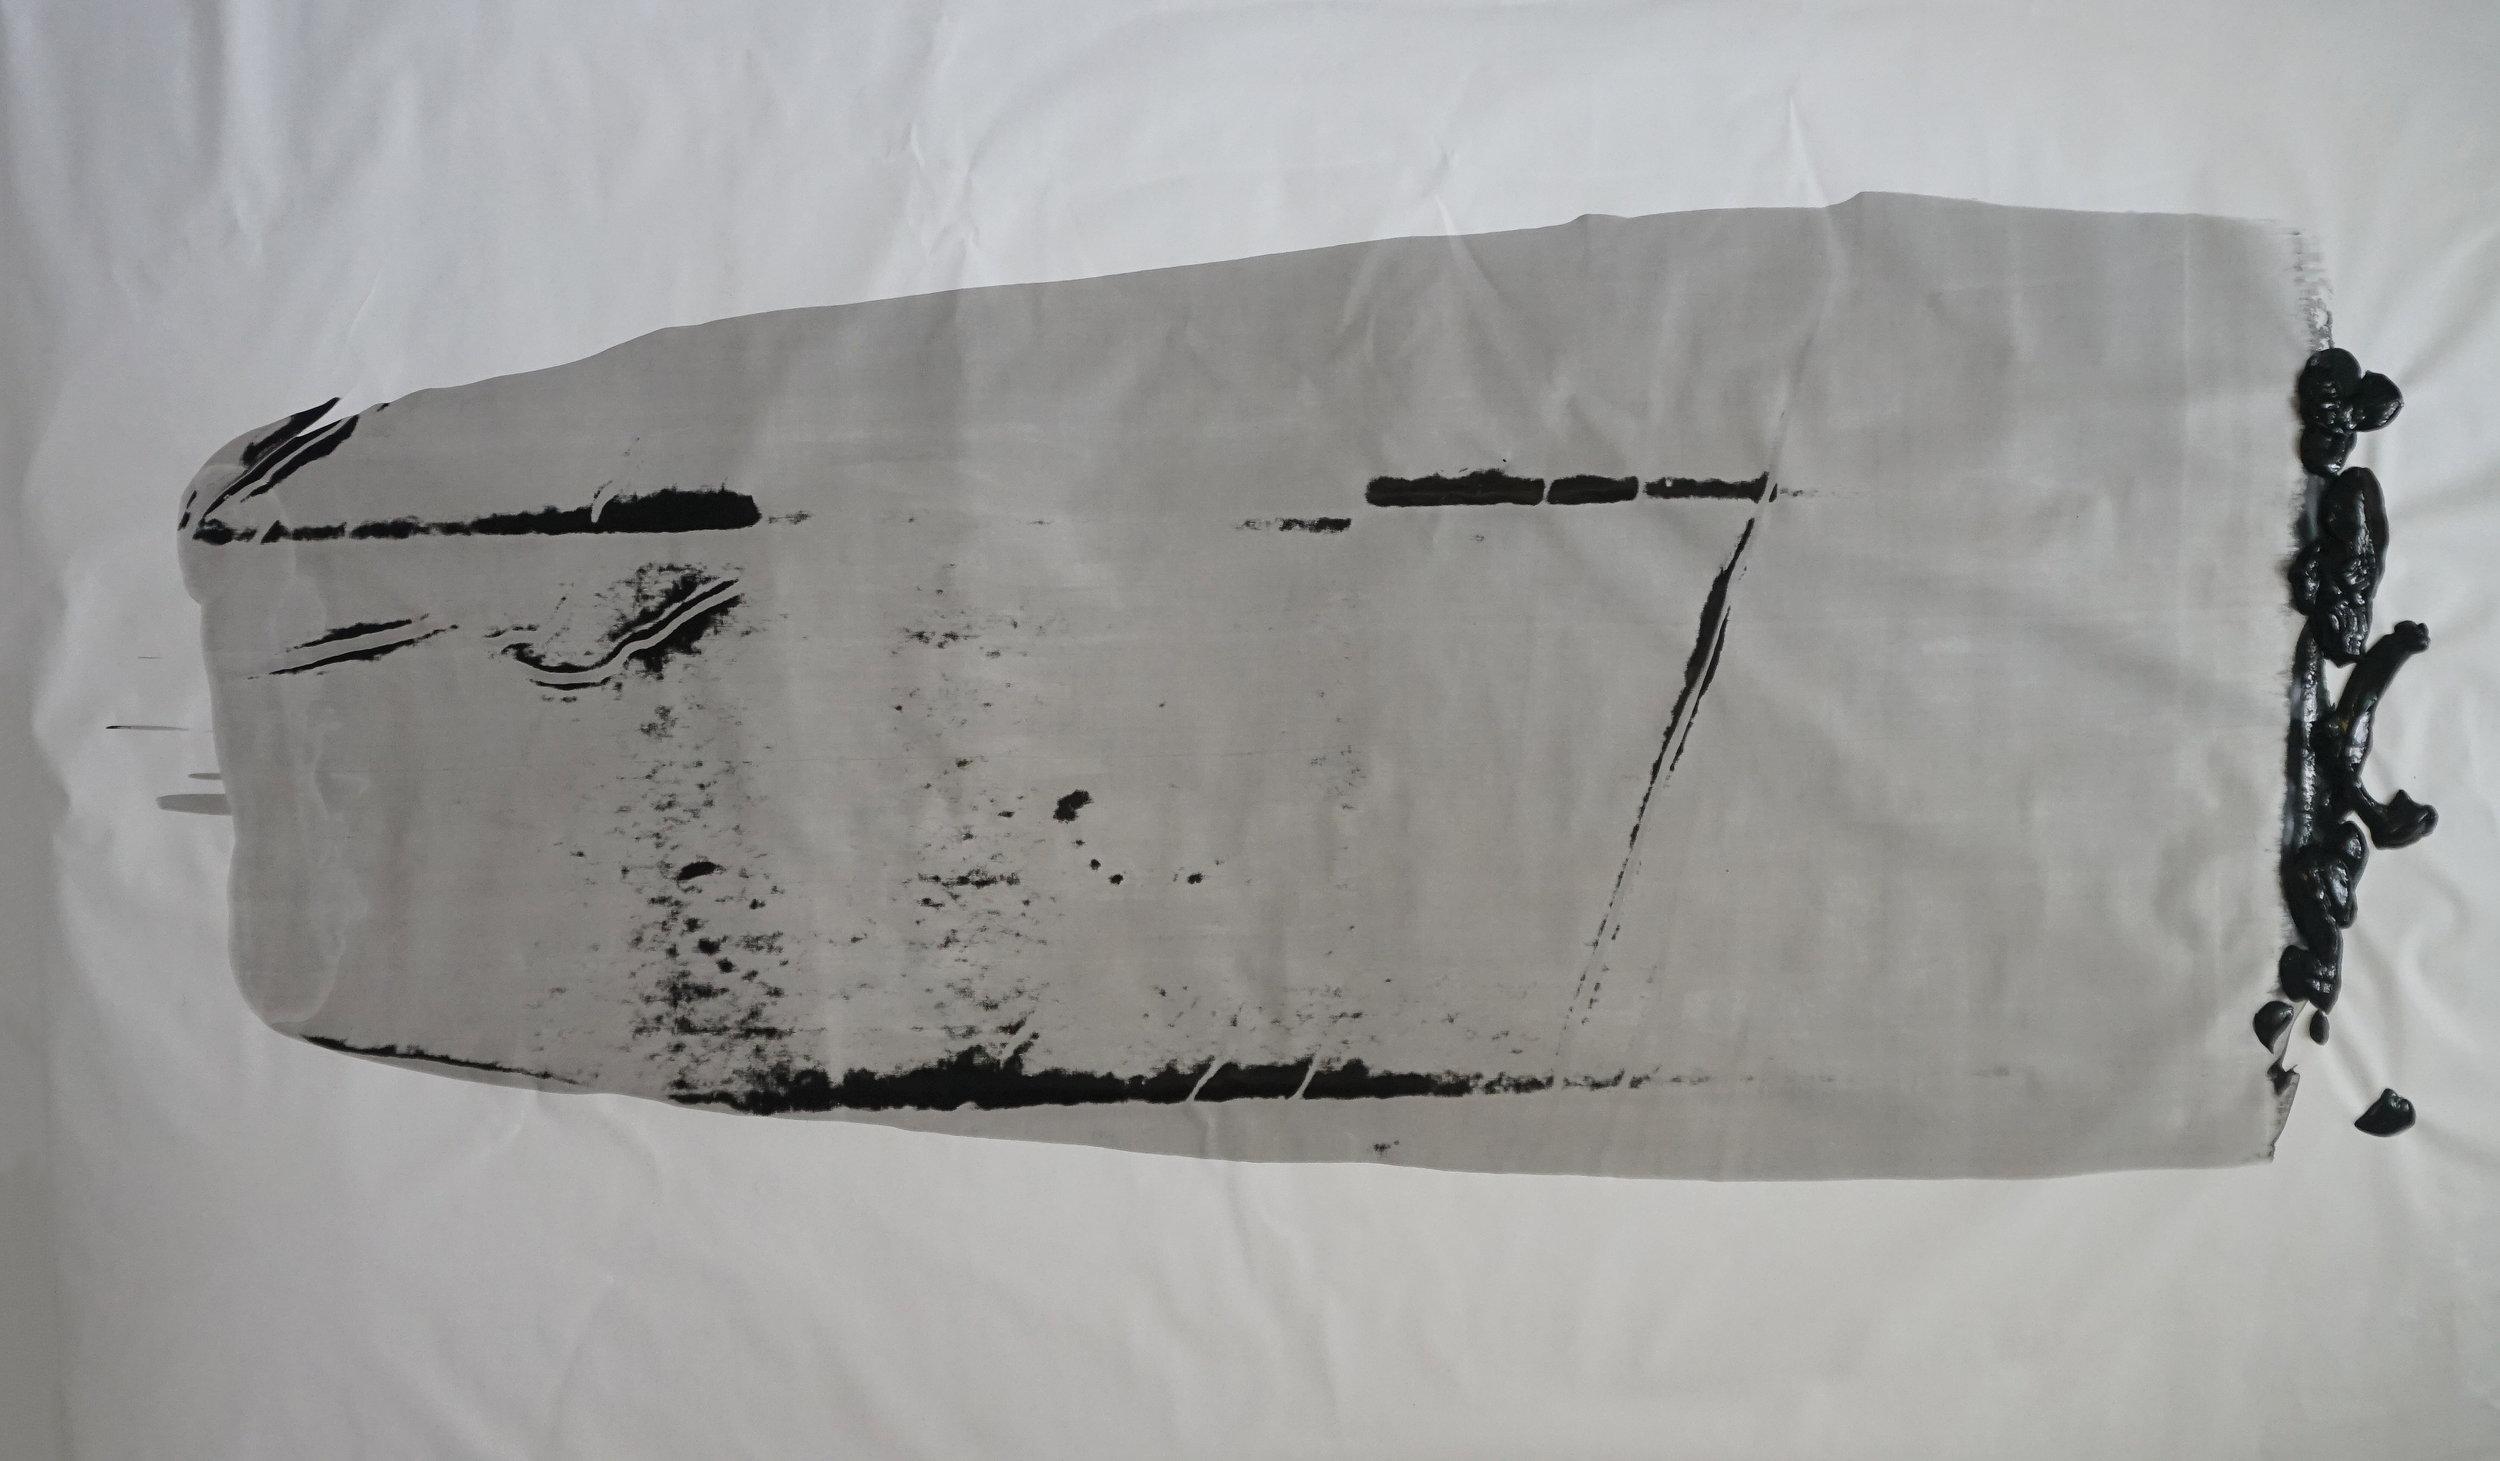 JESSE WAUGH   DEATH MAKES THE MARKET   2018 ACRAMINE ON CANVAS 195 X 114 CM